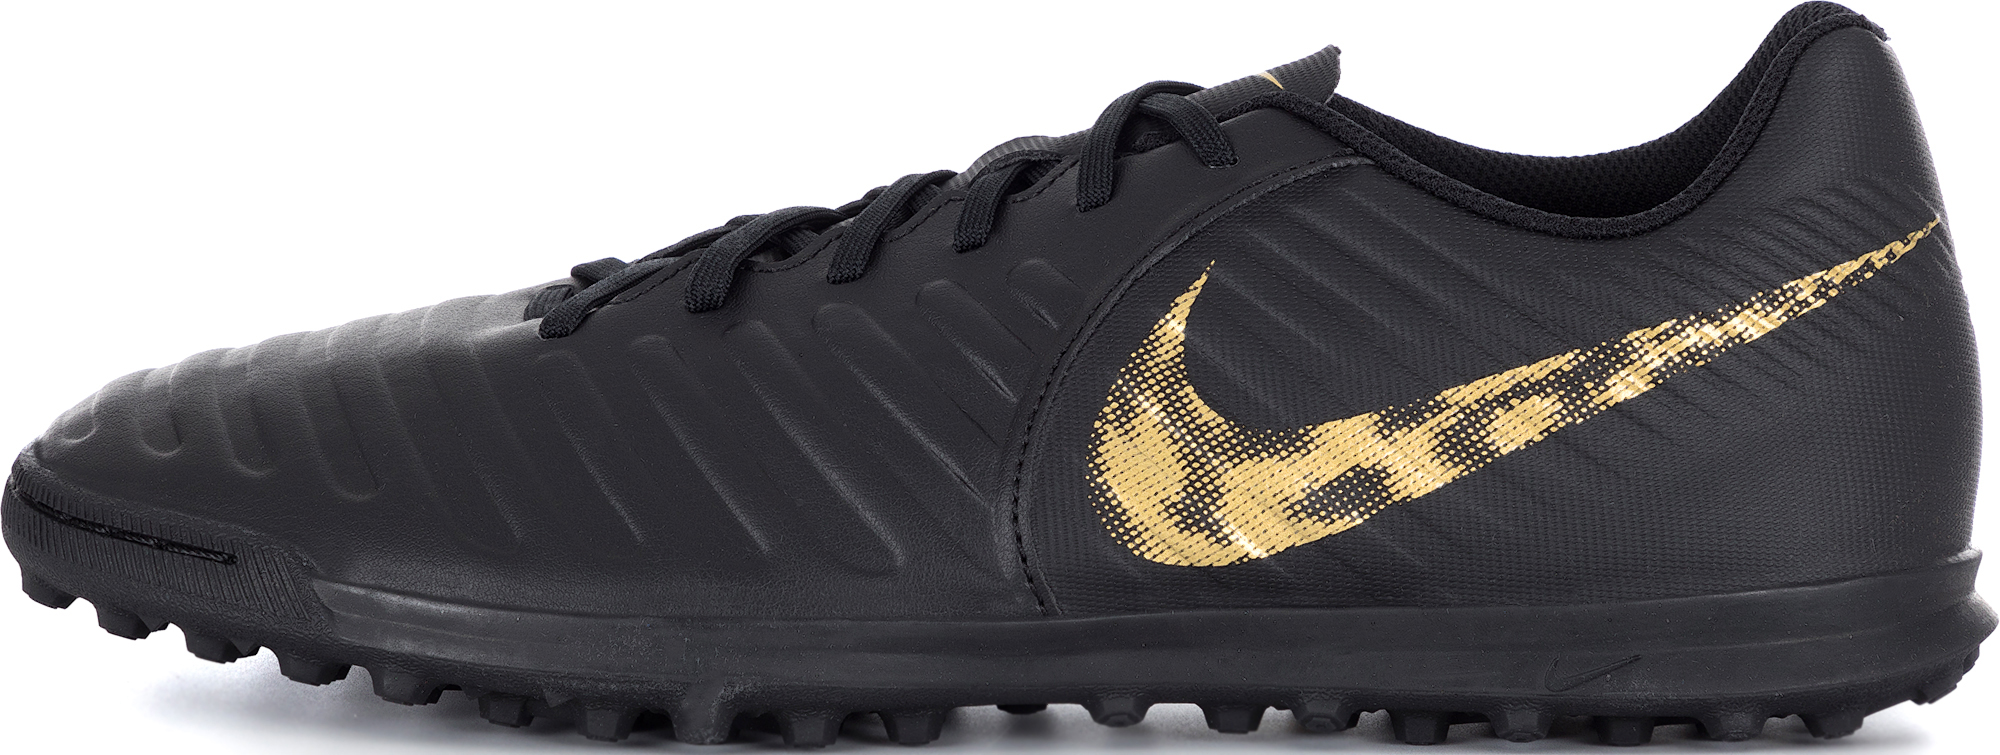 Nike Бутсы мужские Nike Legend 7 Club TF, размер 45